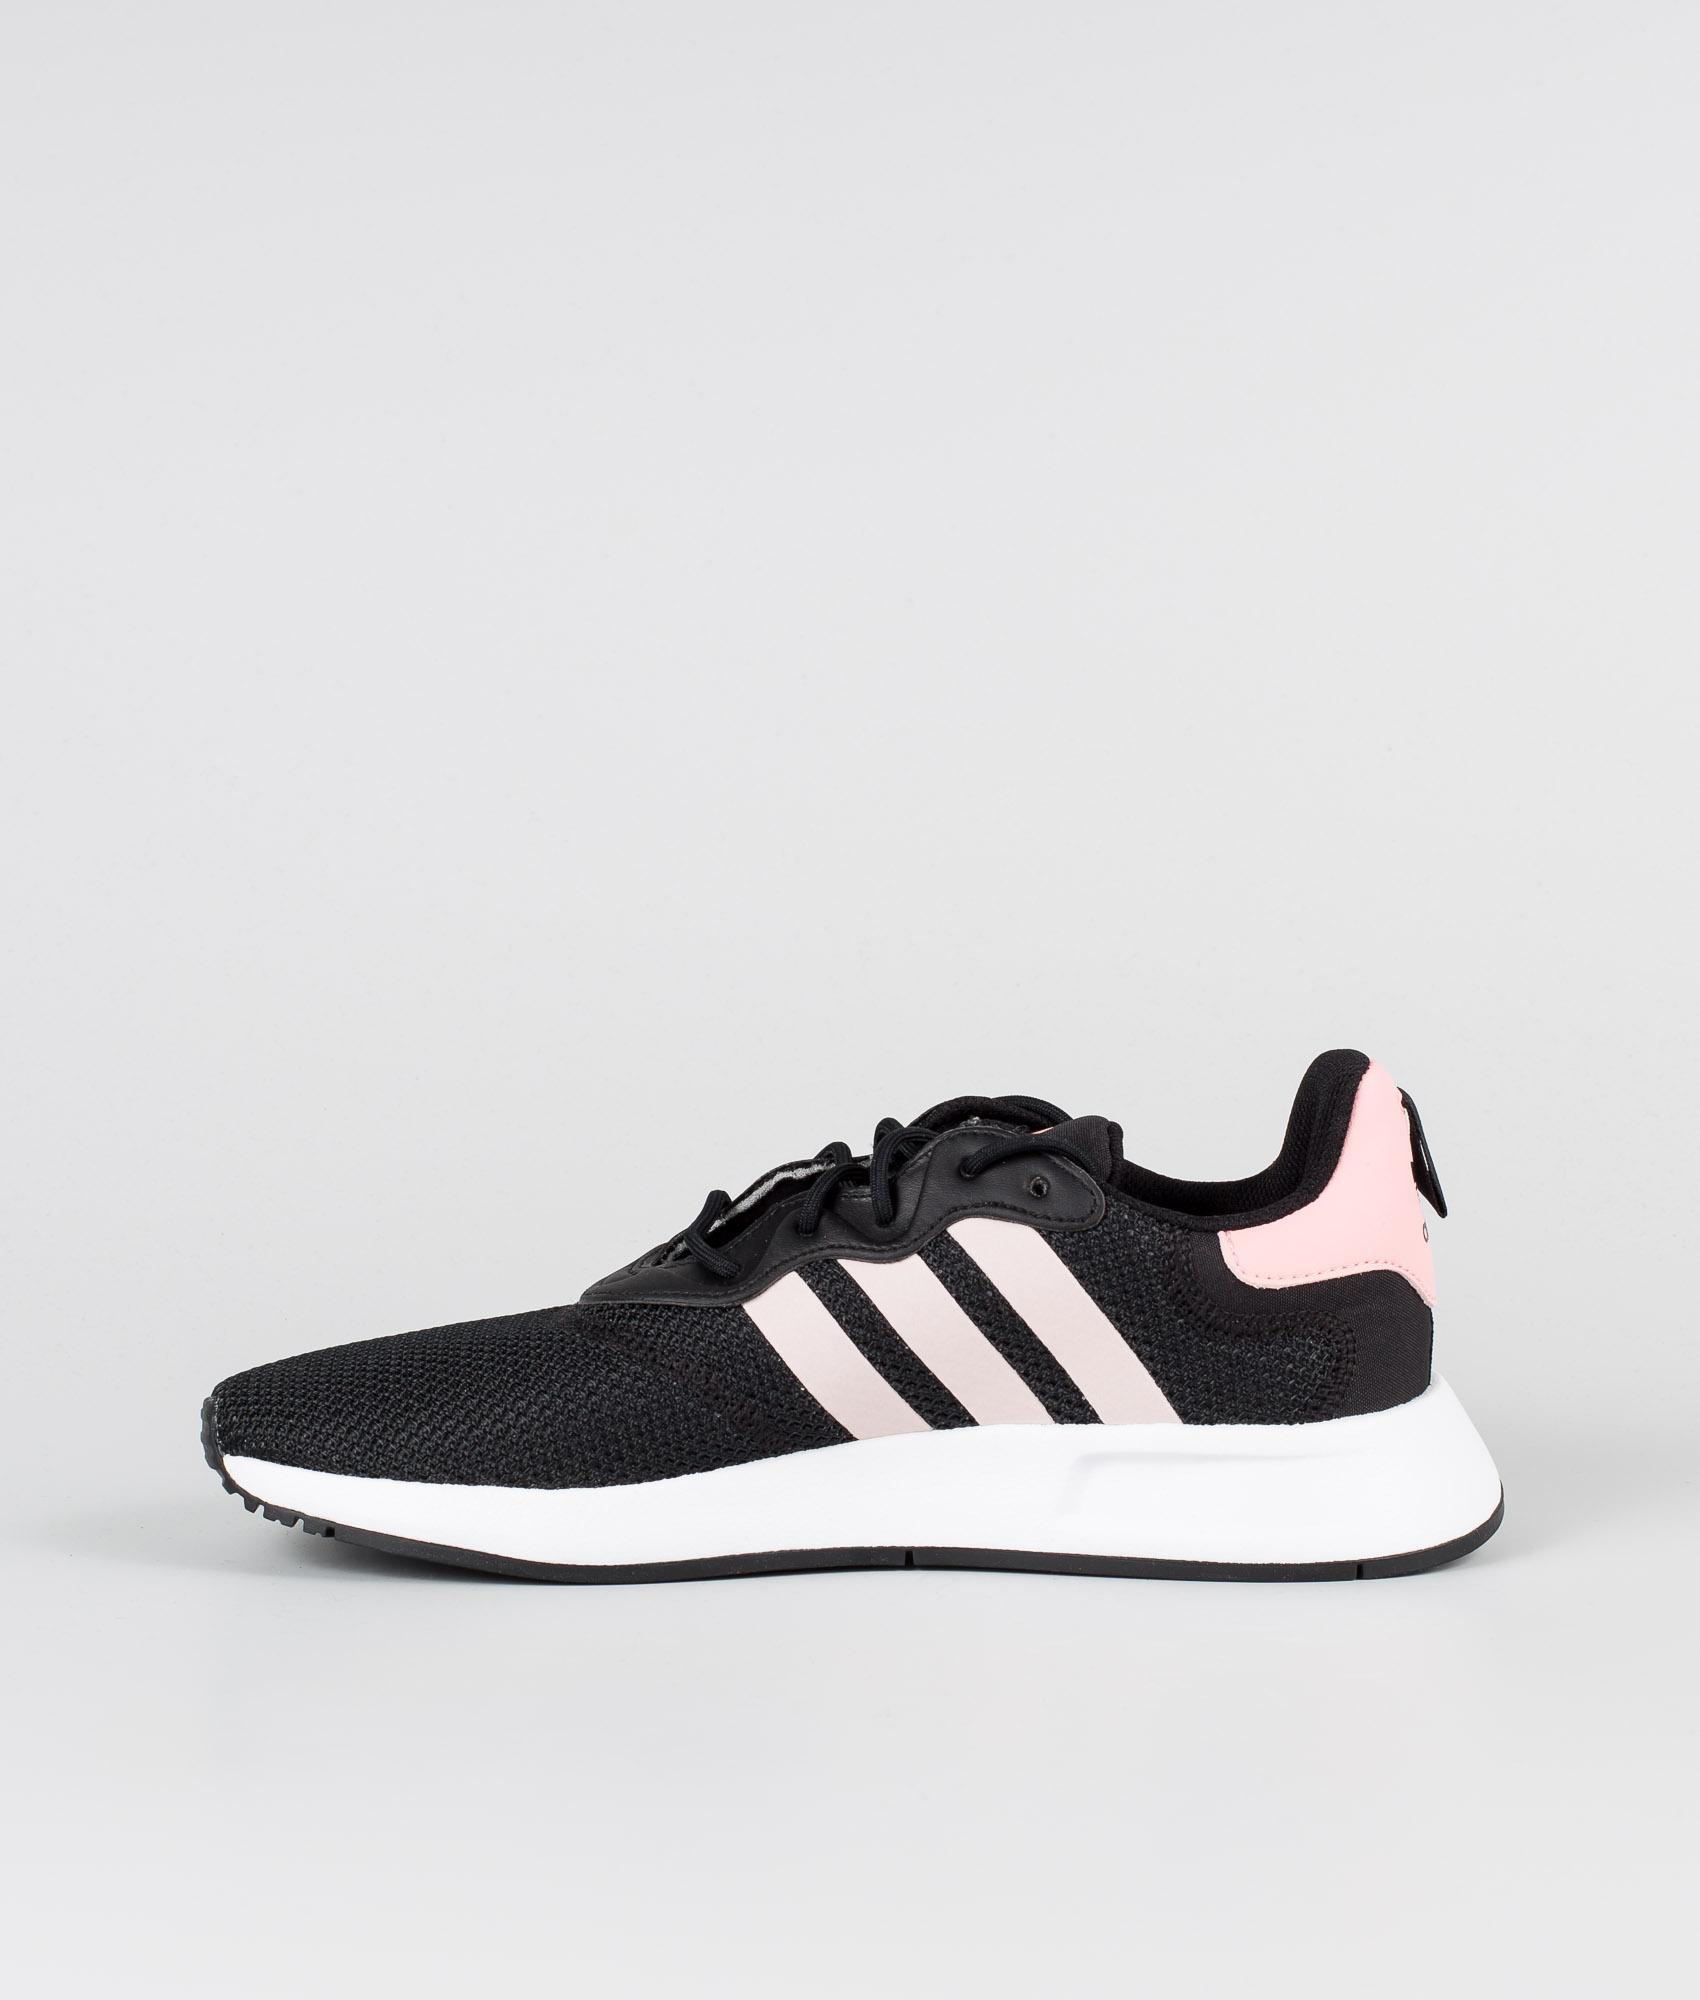 Adidas Originals X_Plr S W Sko Core BlackGlopnkFootwear White